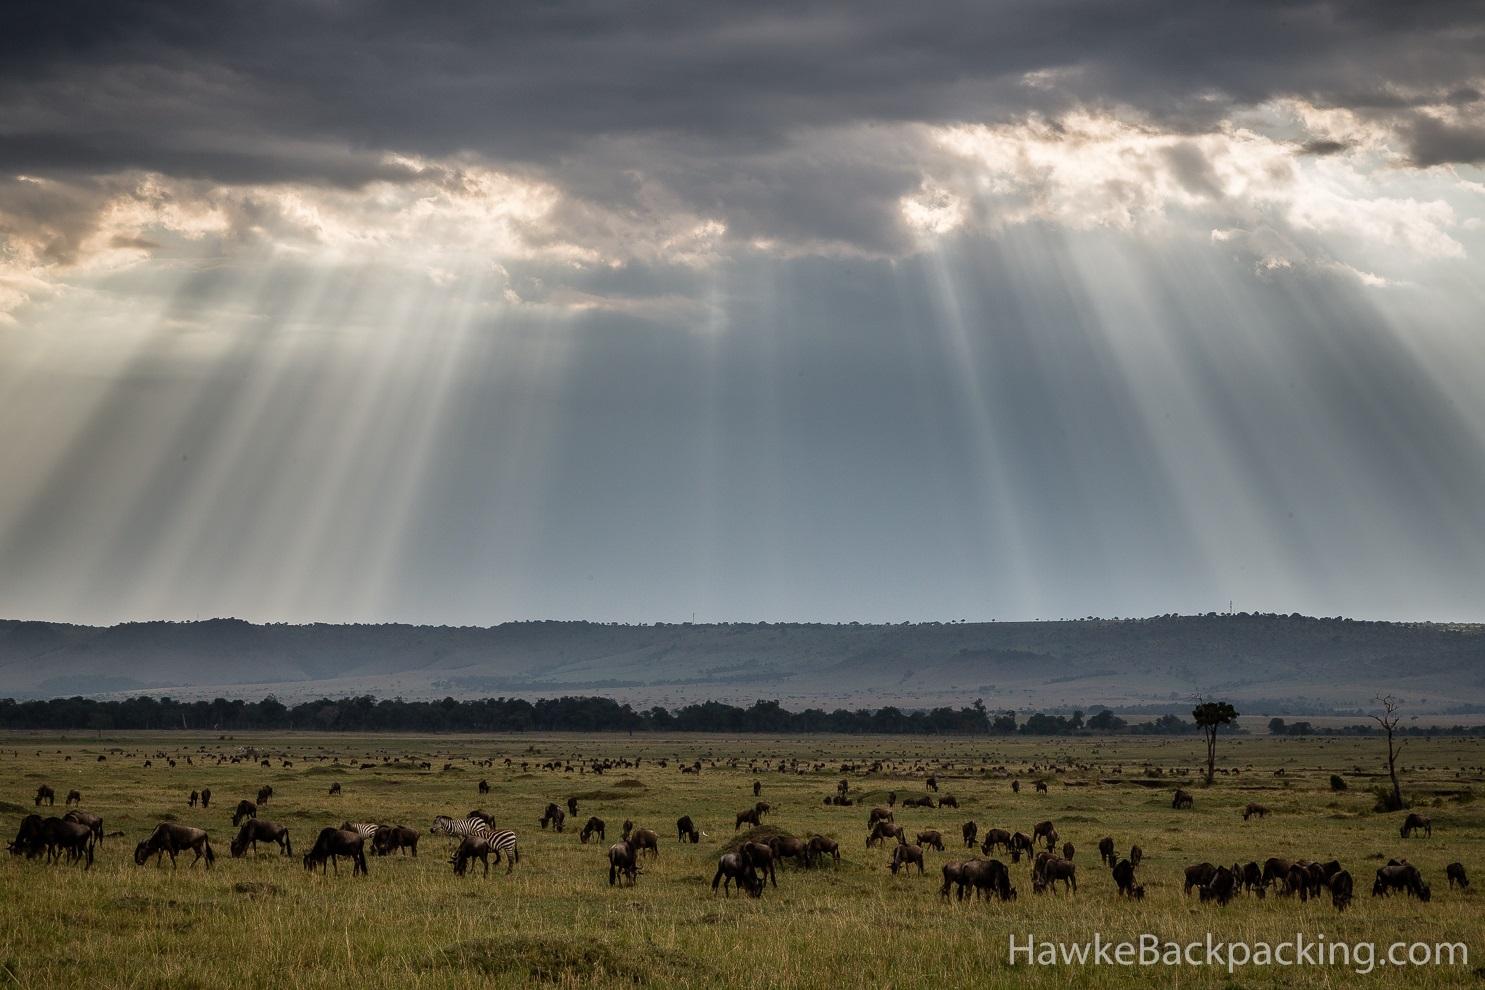 Maasai Mara National Reserve Hawkebackpacking Com